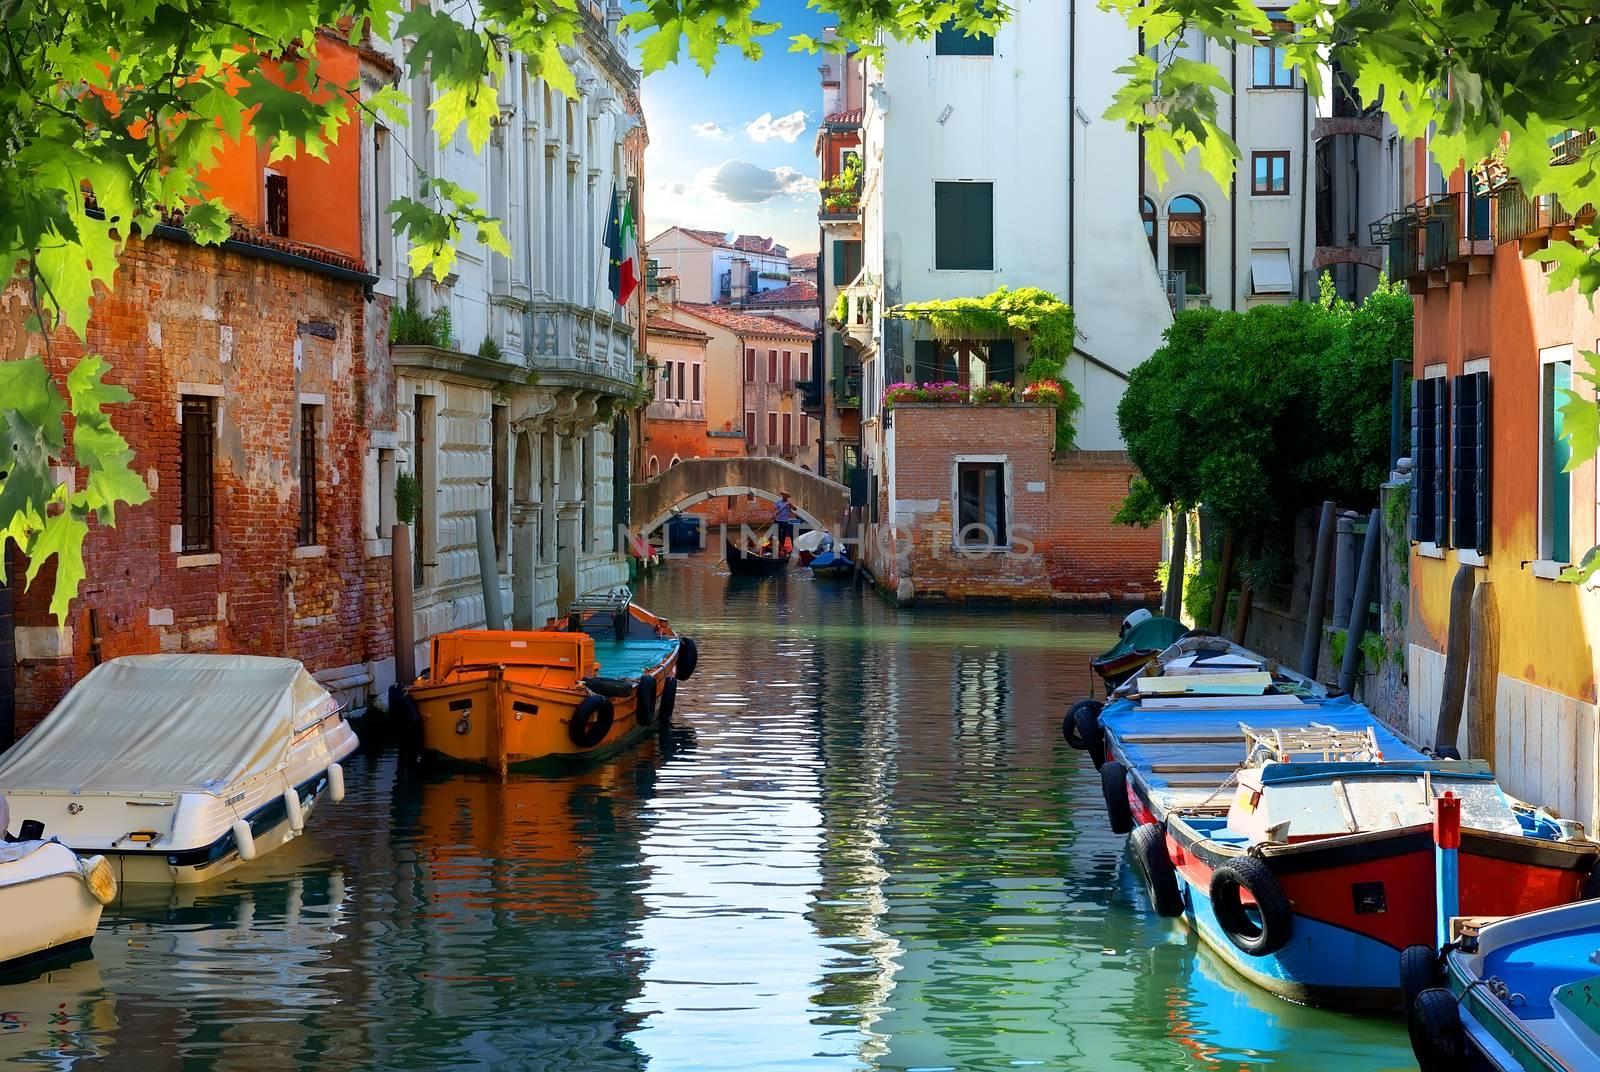 Sunny day in the street of Venice, Italy